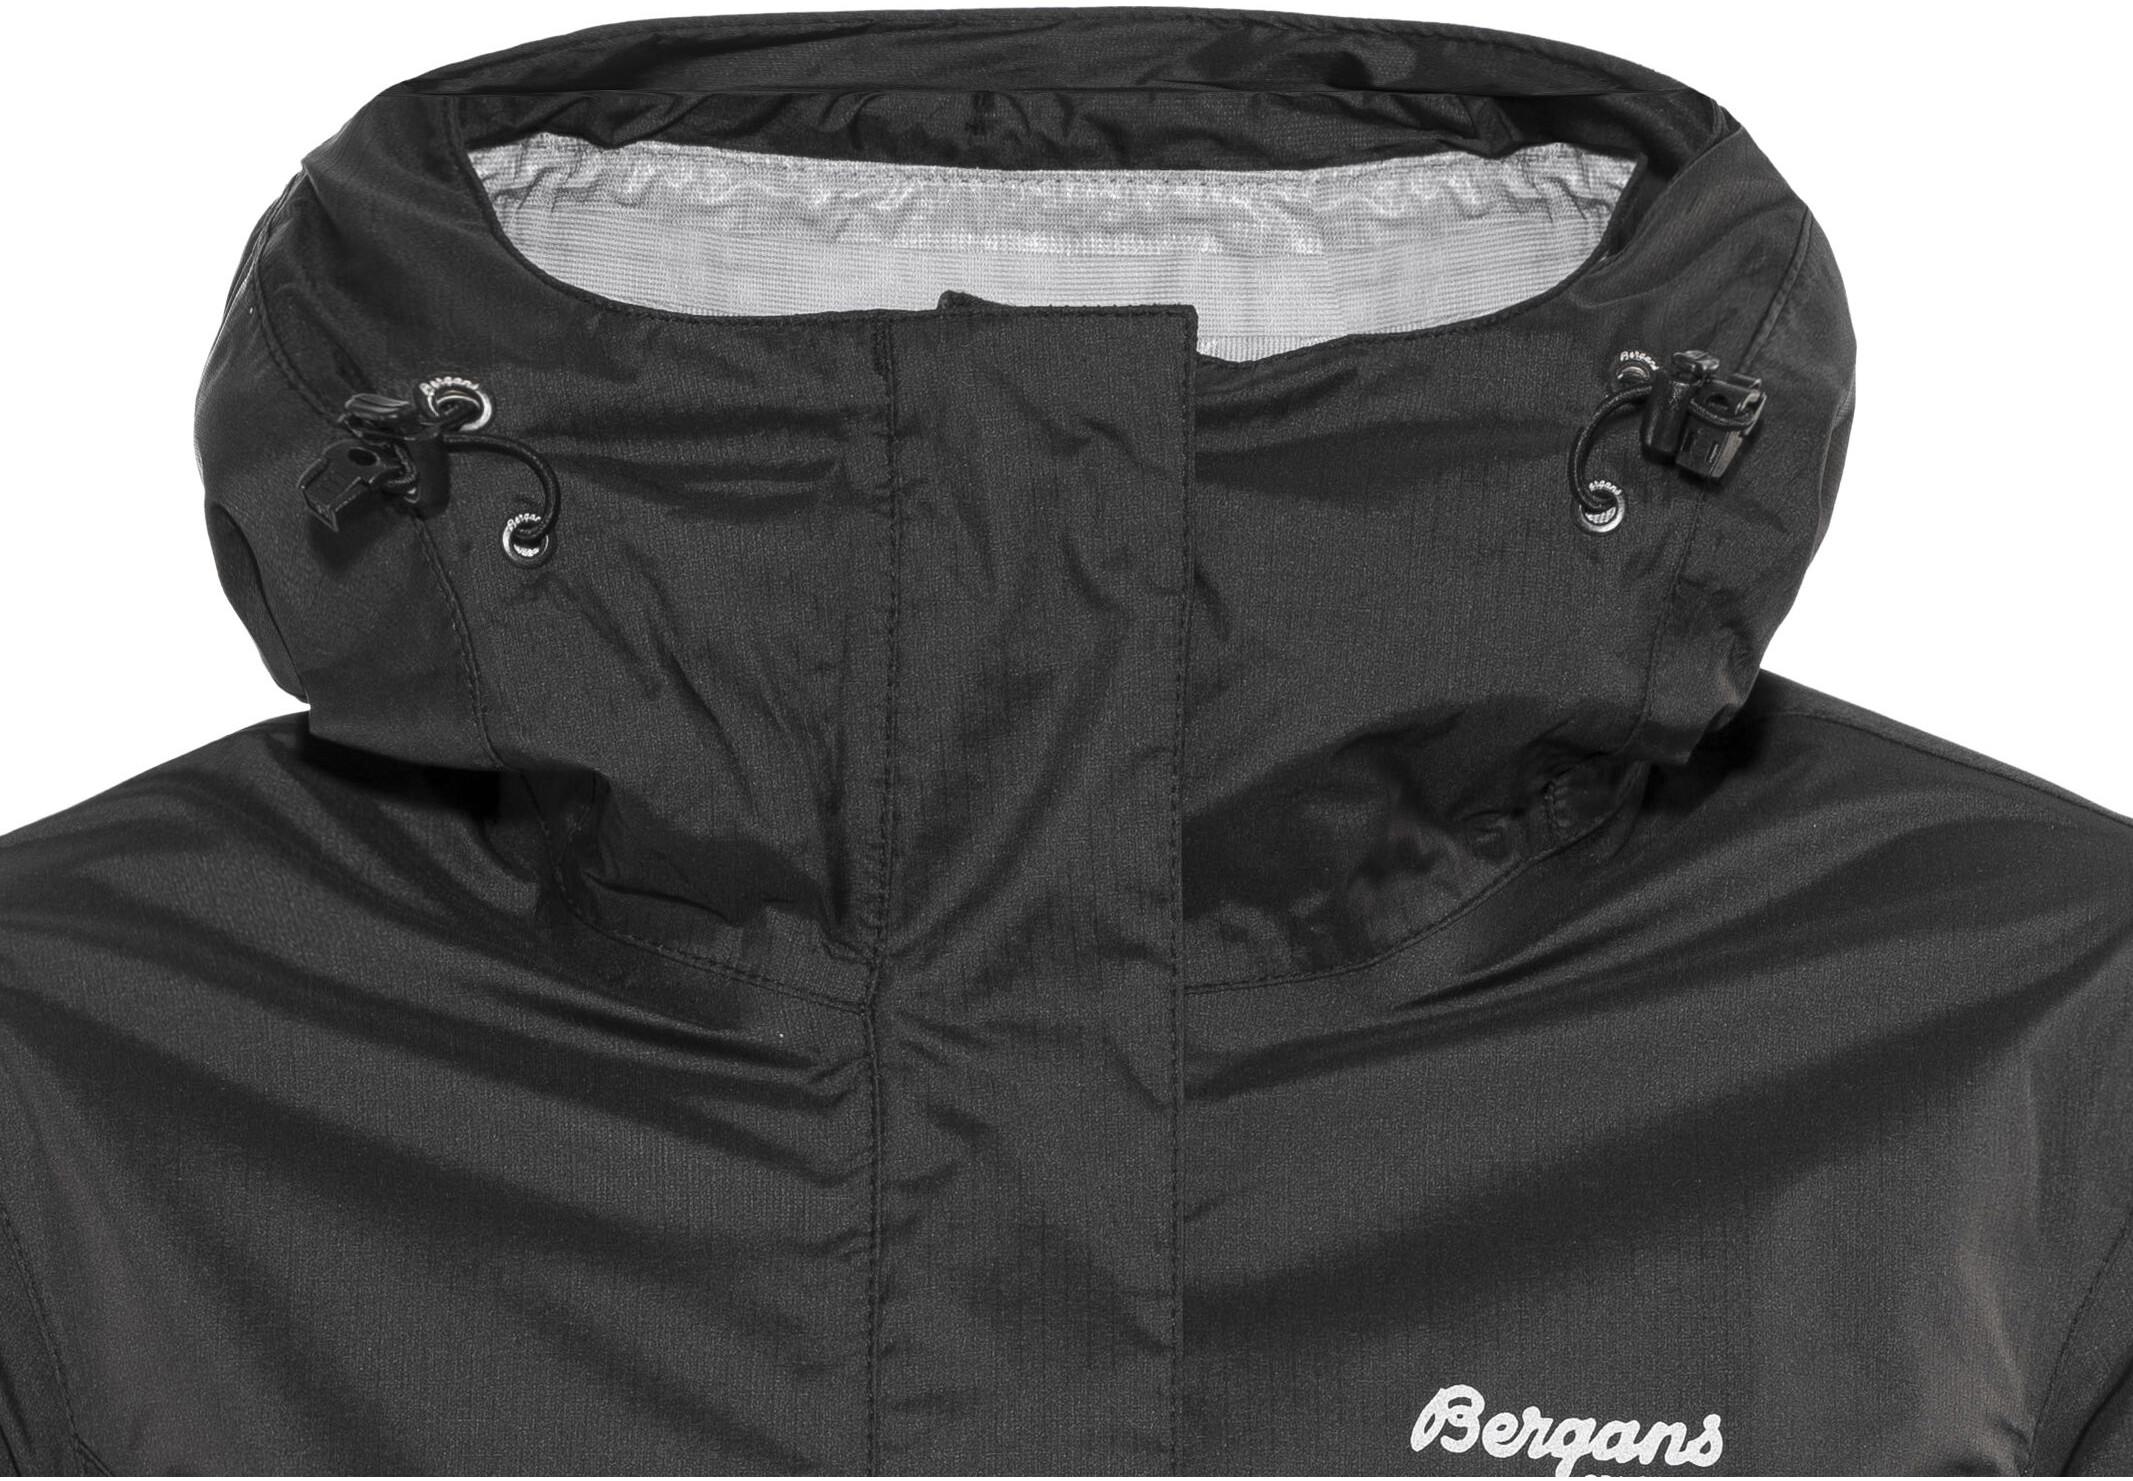 bc95a38d Bergans Super Lett Jacket Women black at Addnature.co.uk